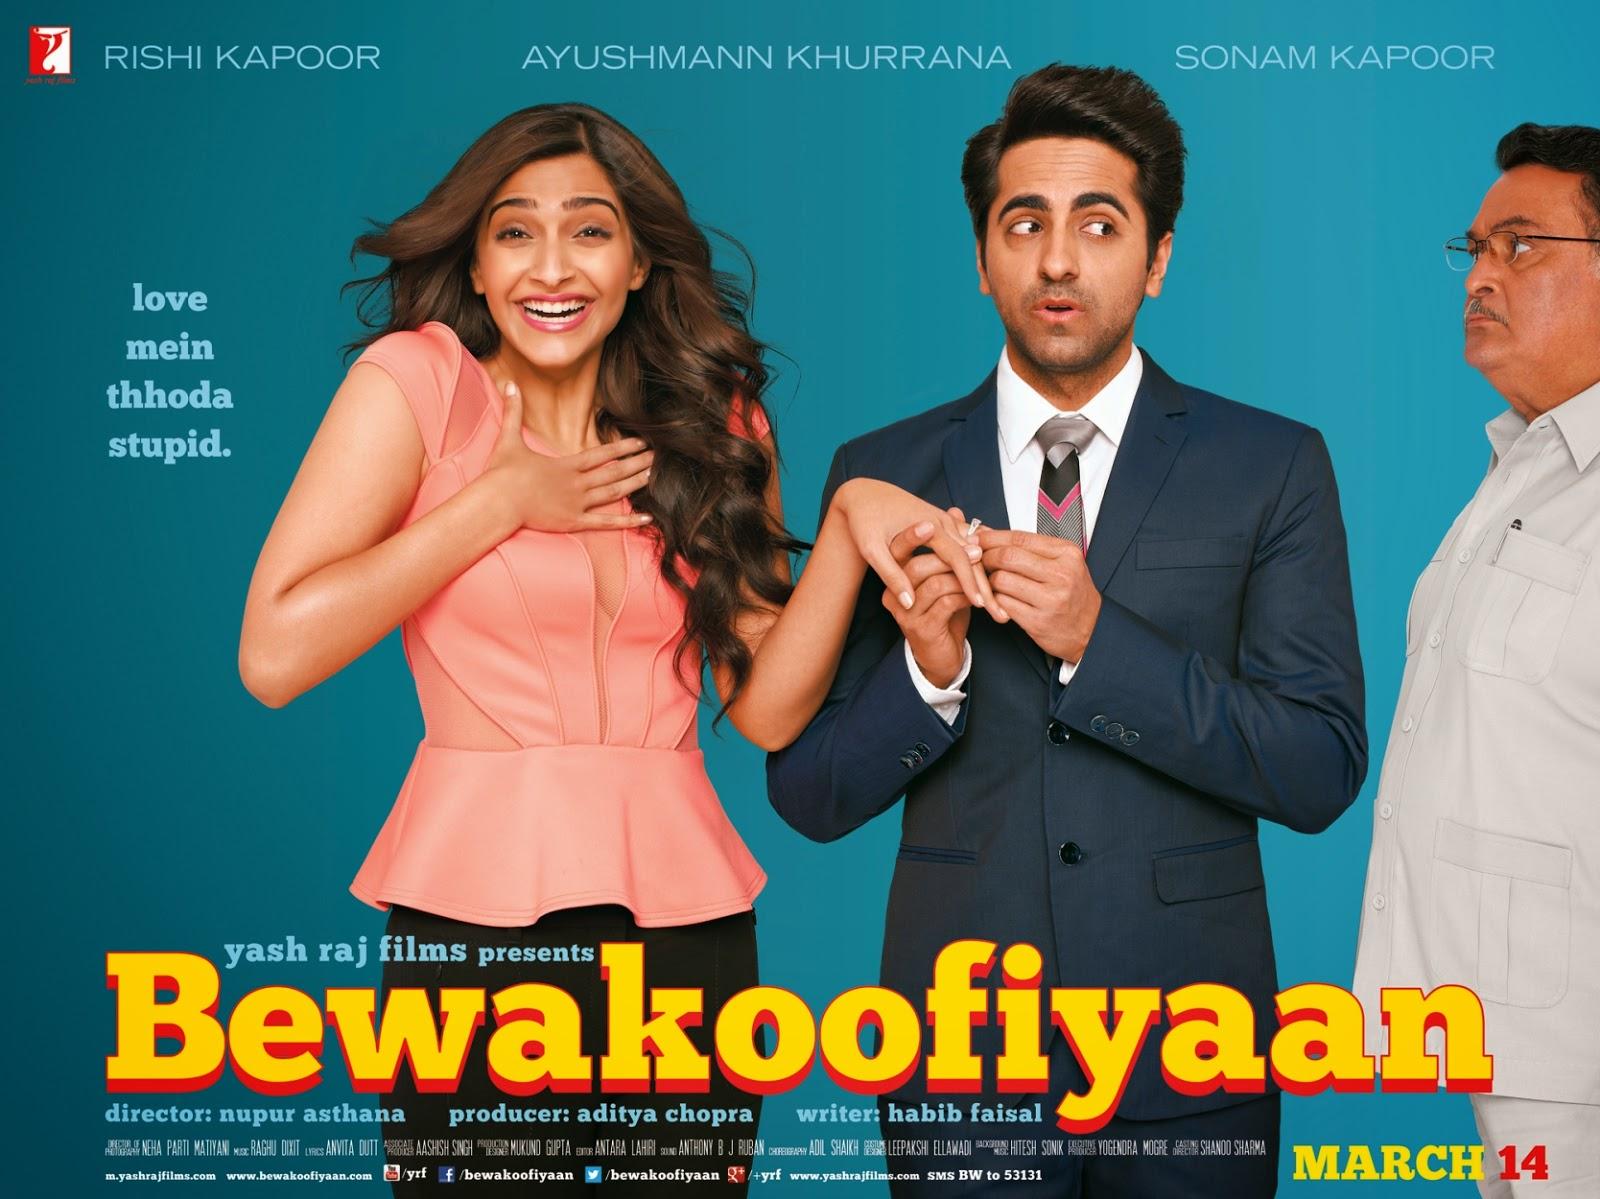 bewakoofiyaan 2014 full movie hindi direct download